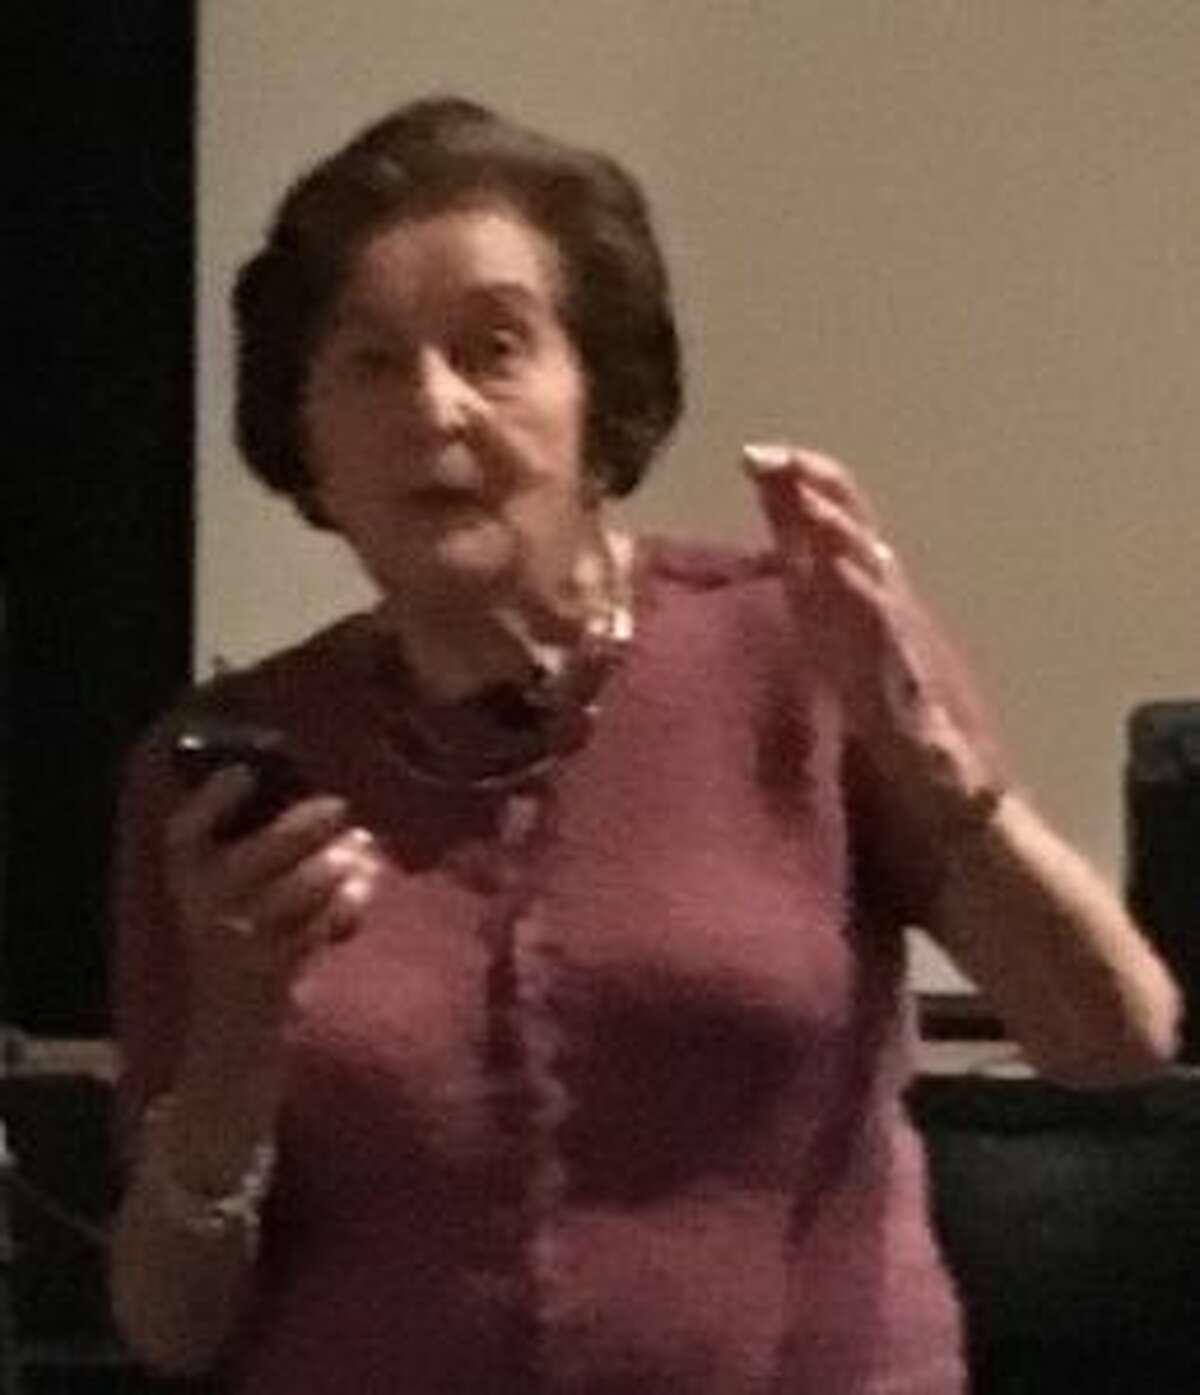 Judith Altmann speaking at Middlebrook School on June 11.